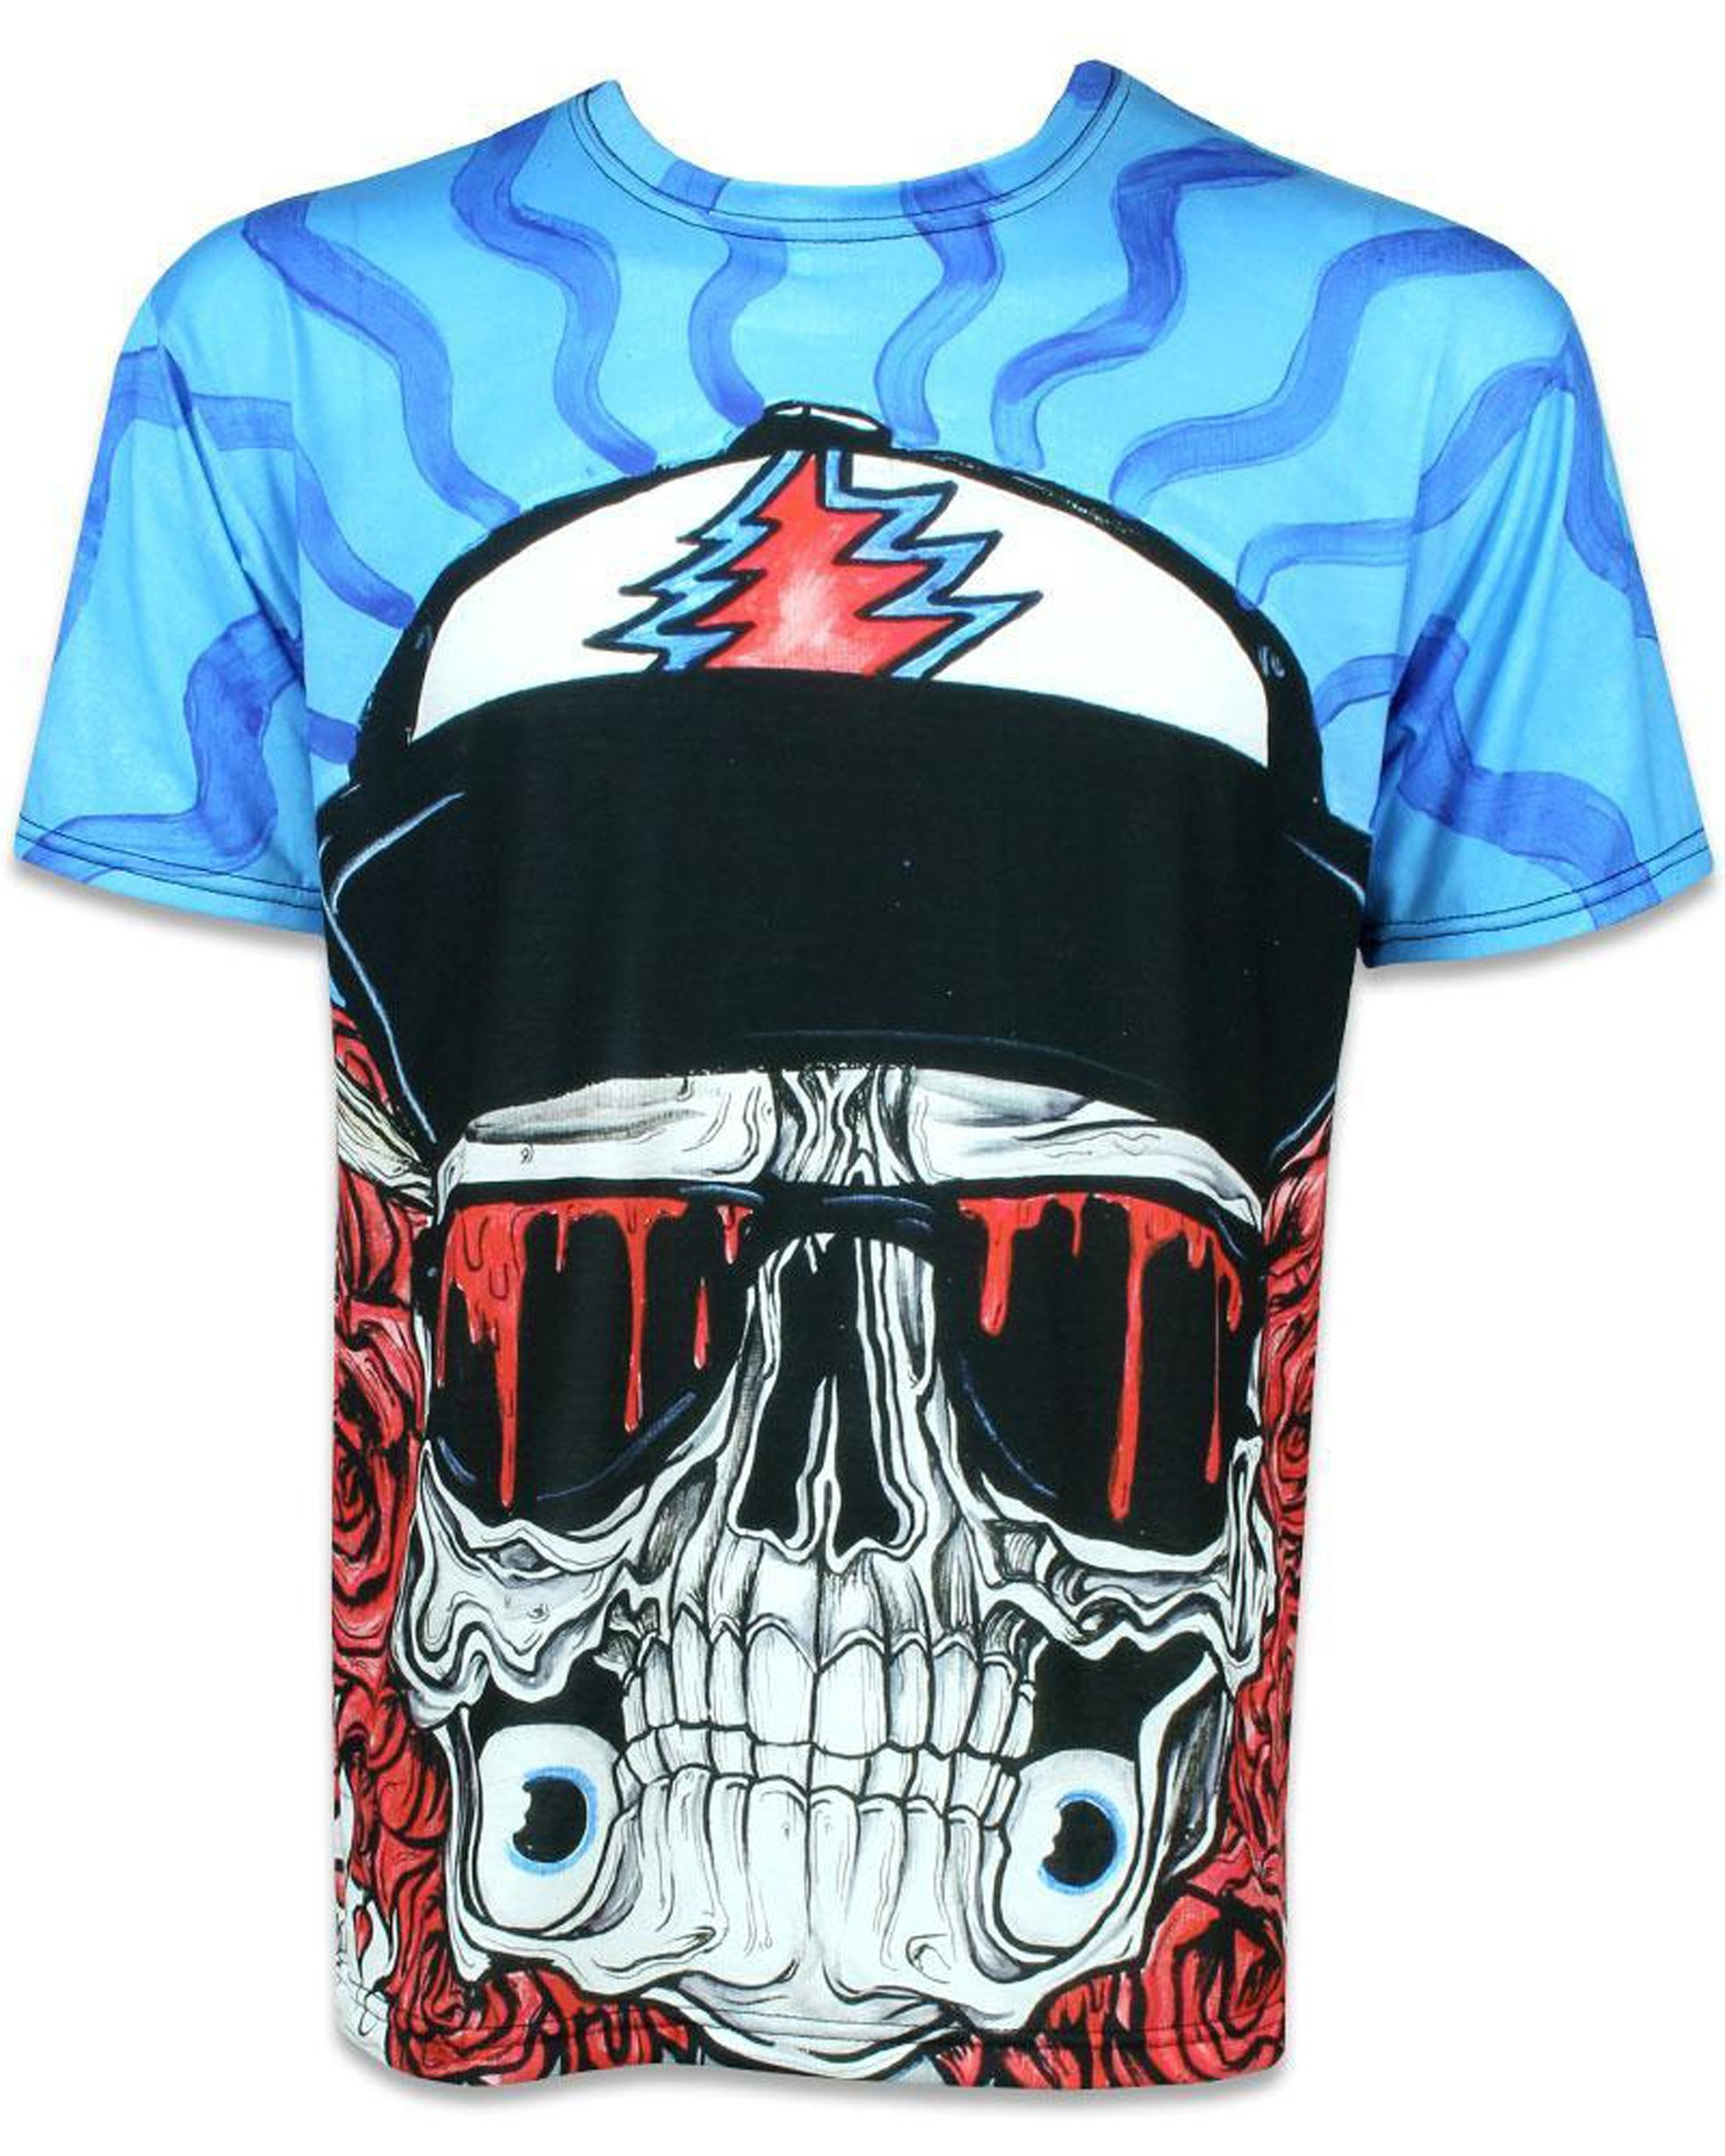 Aaron Brooks Eazy E Rider Short Sleeve Men's T-Shirt (Front)